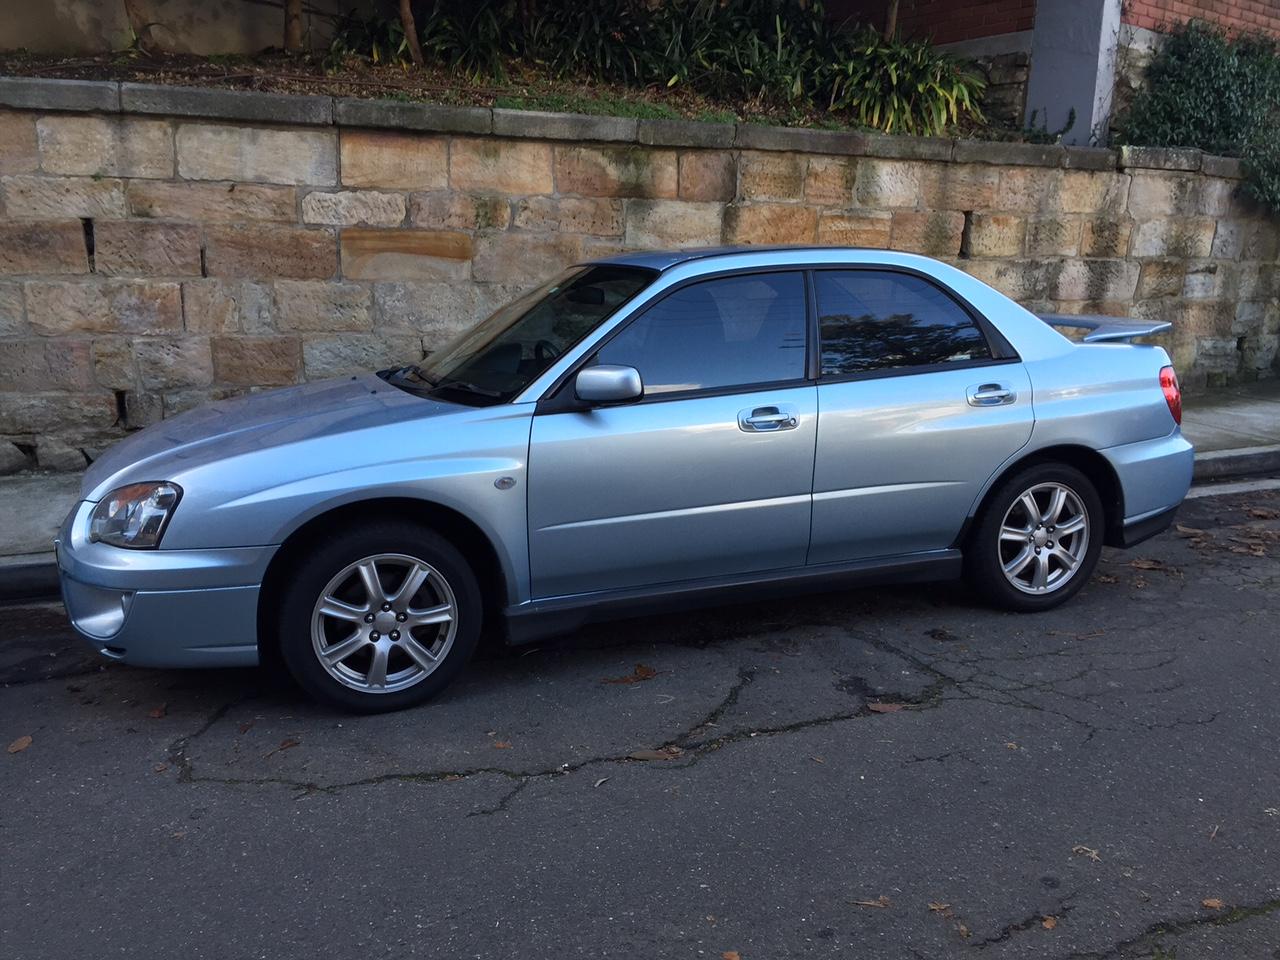 Picture of Olivier's 2005 Subaru Impreza